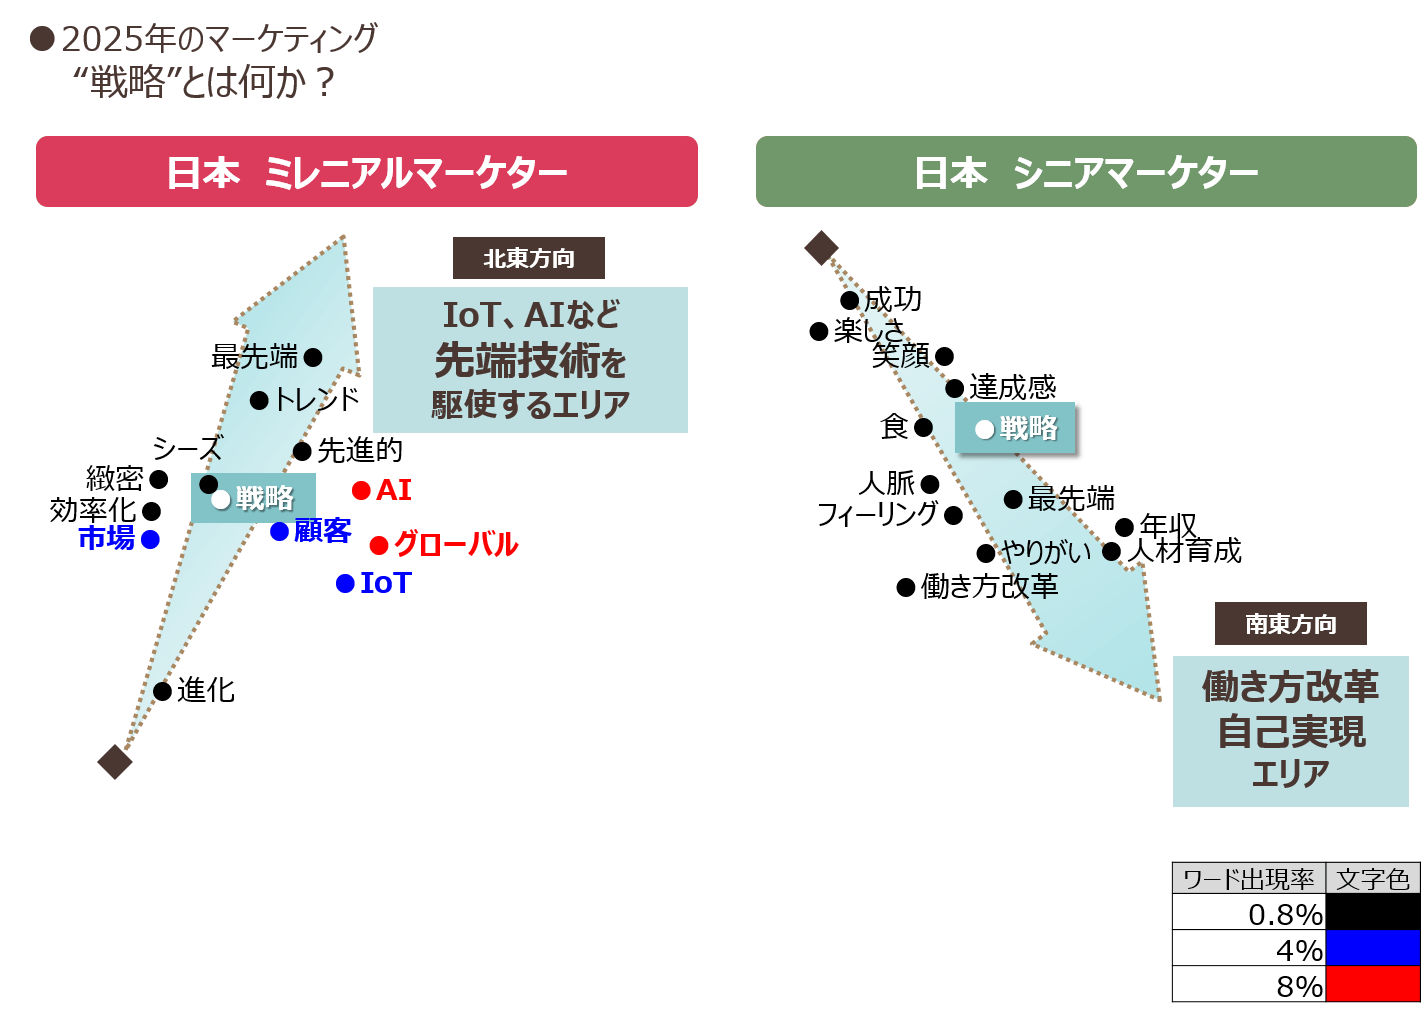 2025marketing2_03.png